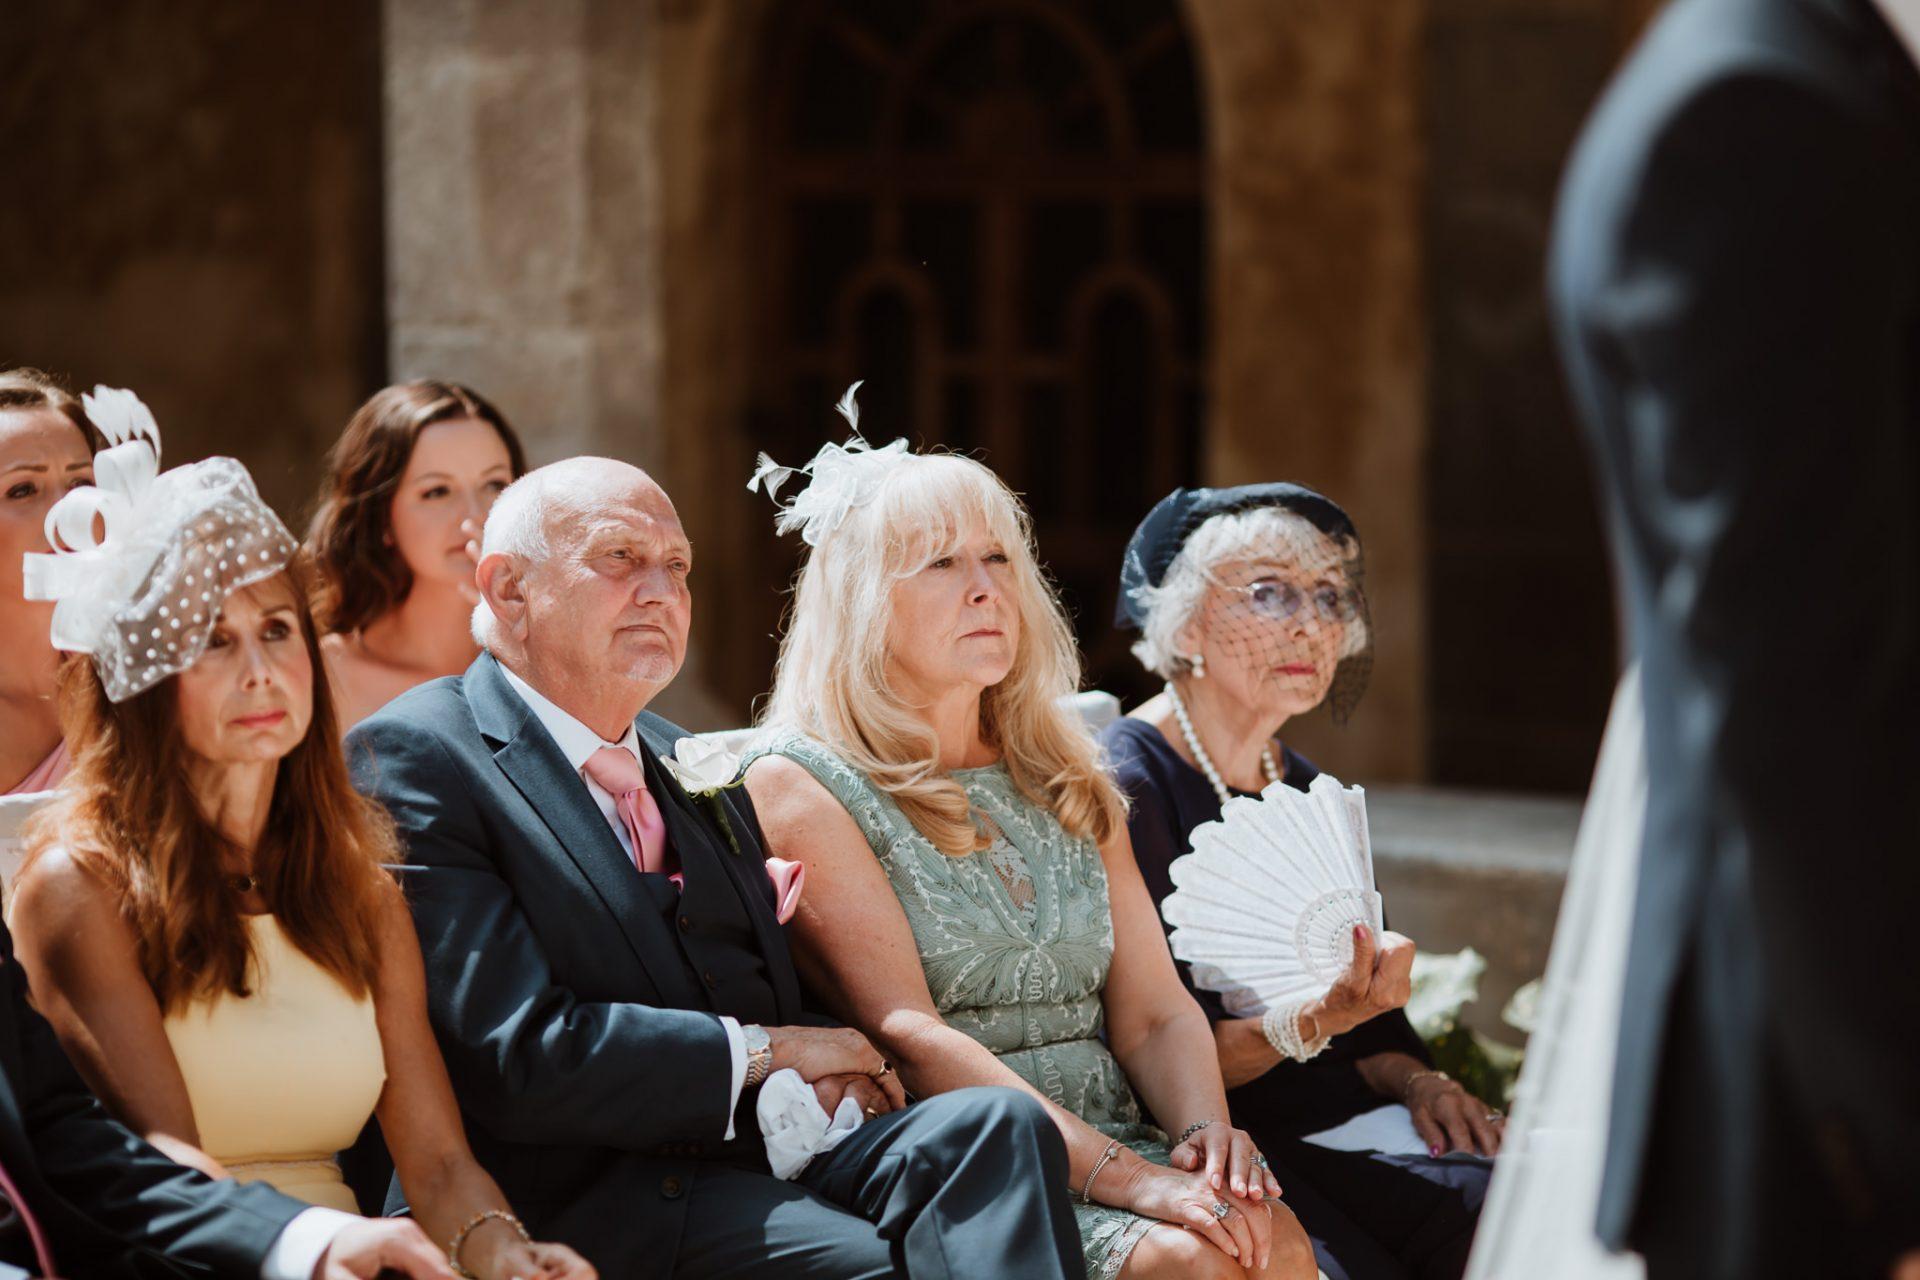 guests wedding ceremony sorrento cloisters chiostro di san francesco